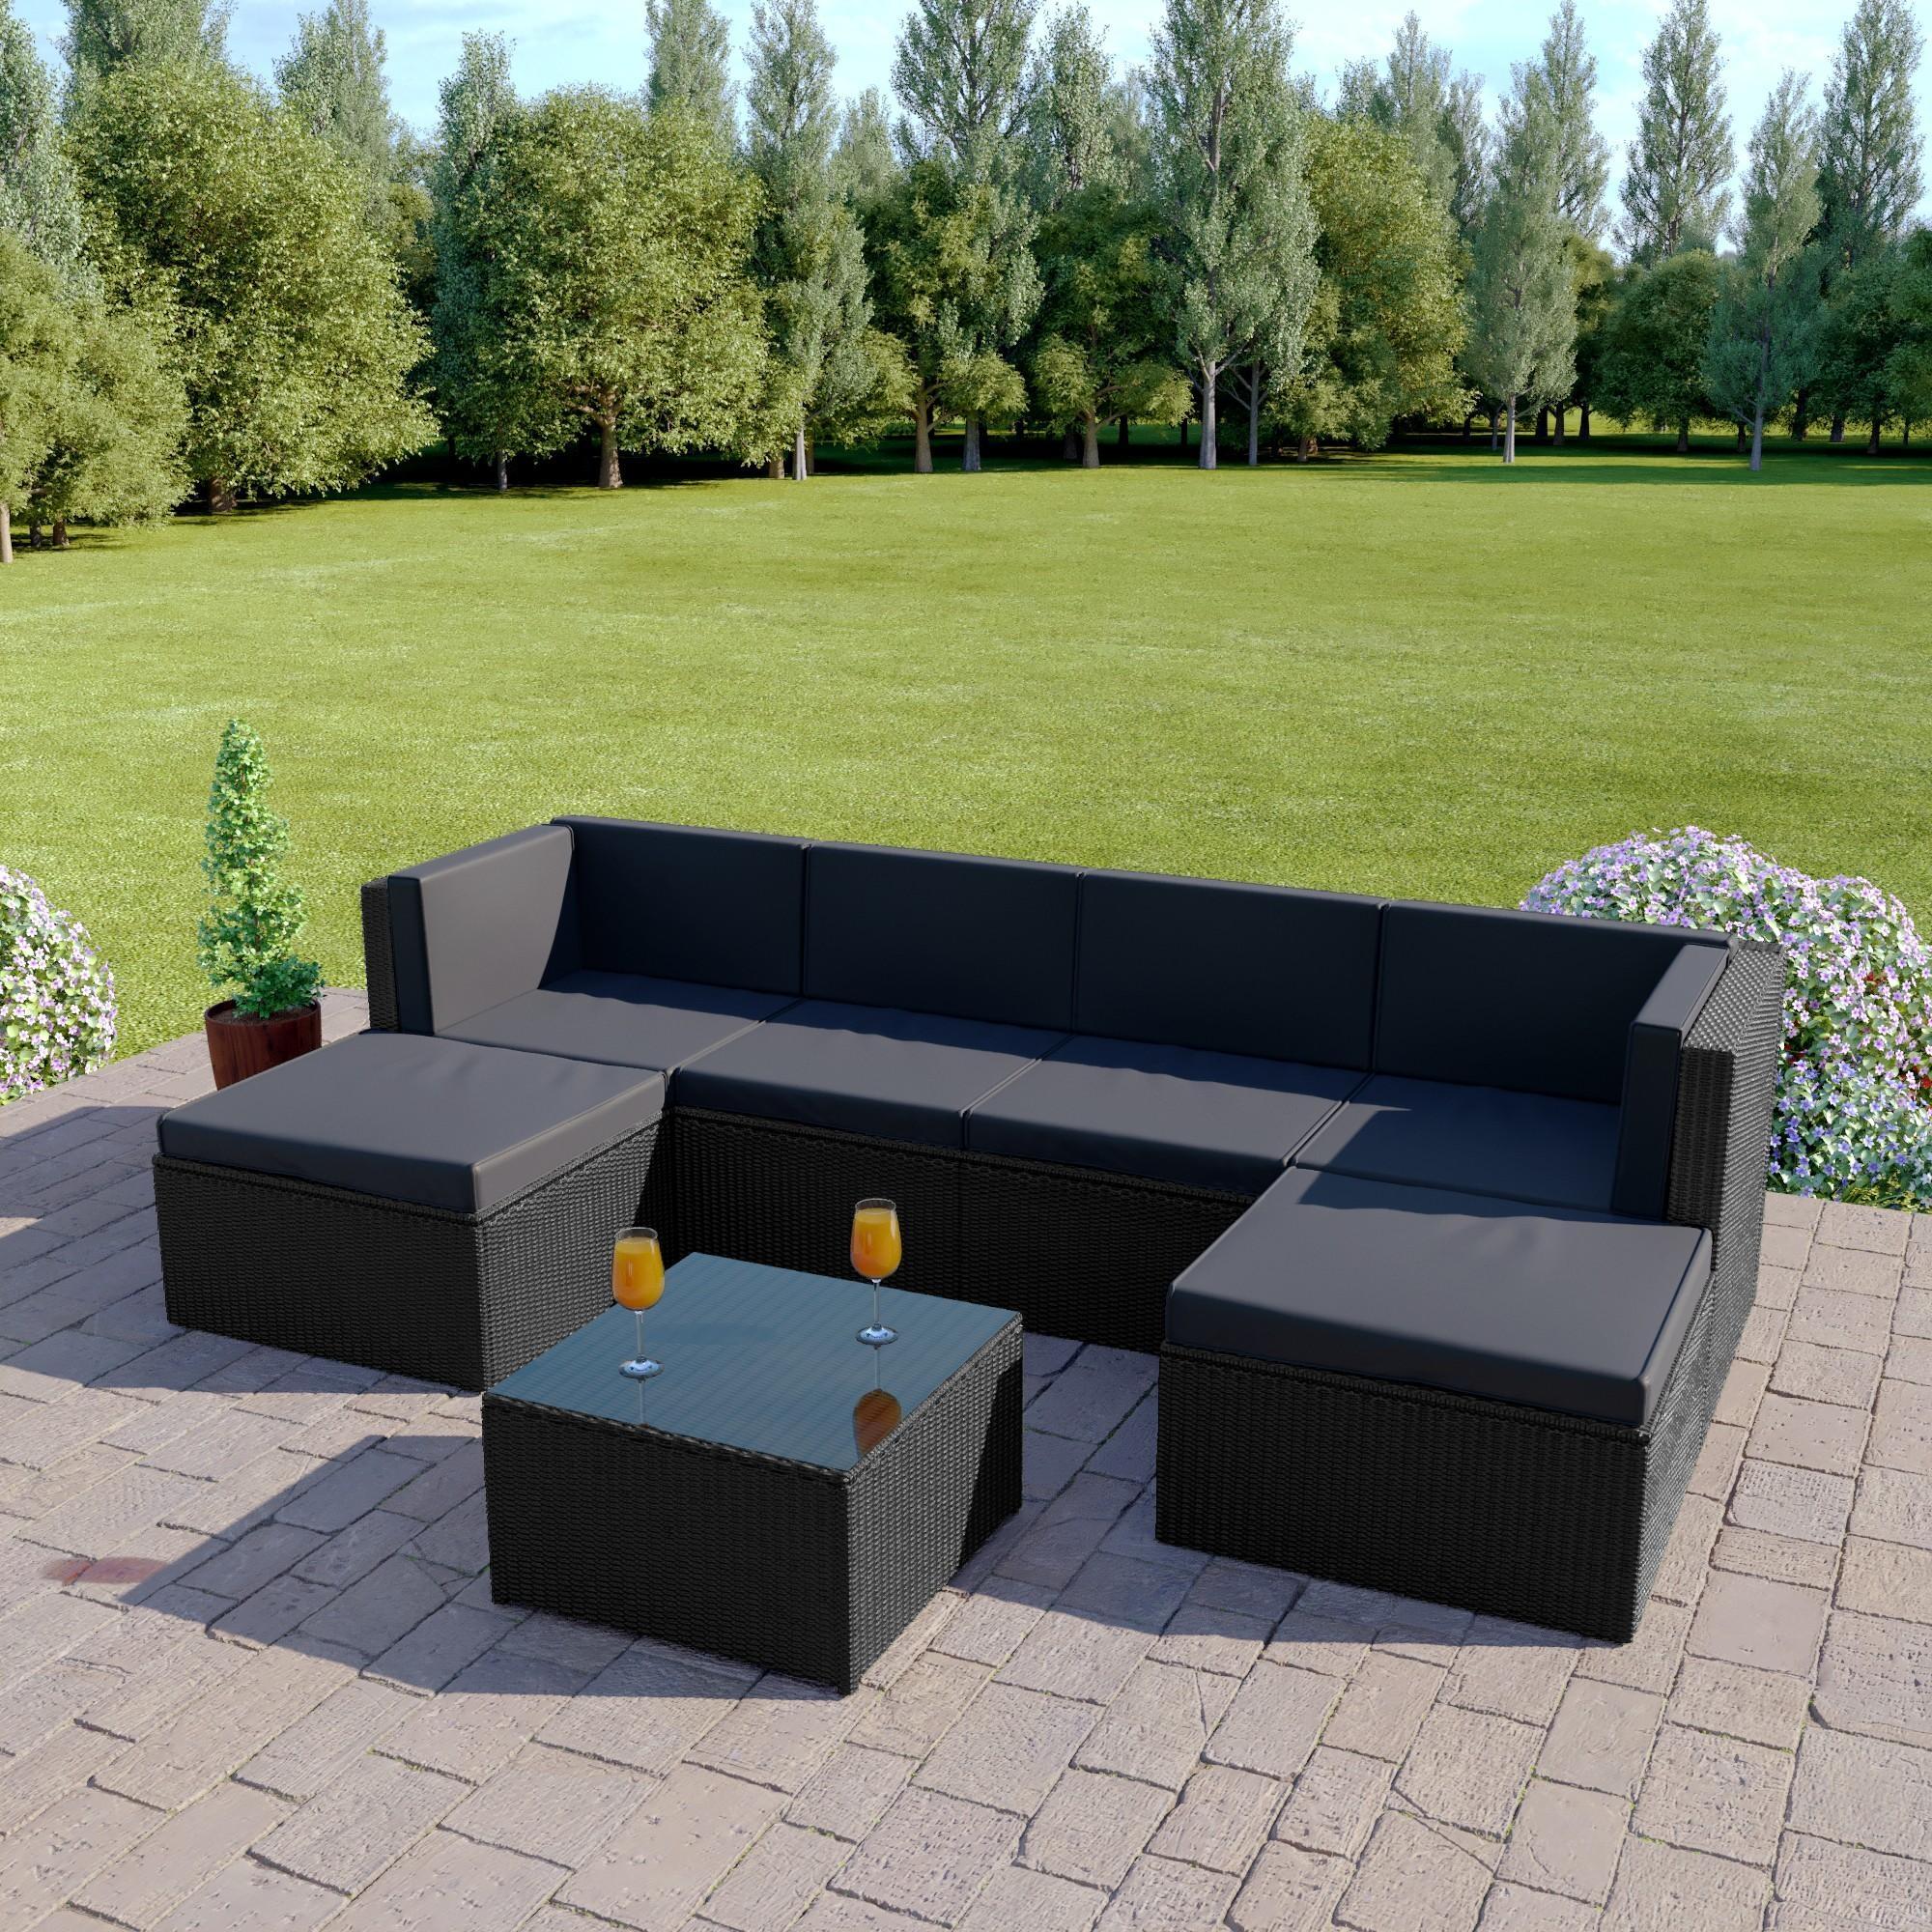 Rattan Corner Sofa Sets | Cheap Outdoor Garden Sets | Rattan Furniture Intended For Black Corner Sofas (Image 18 of 20)